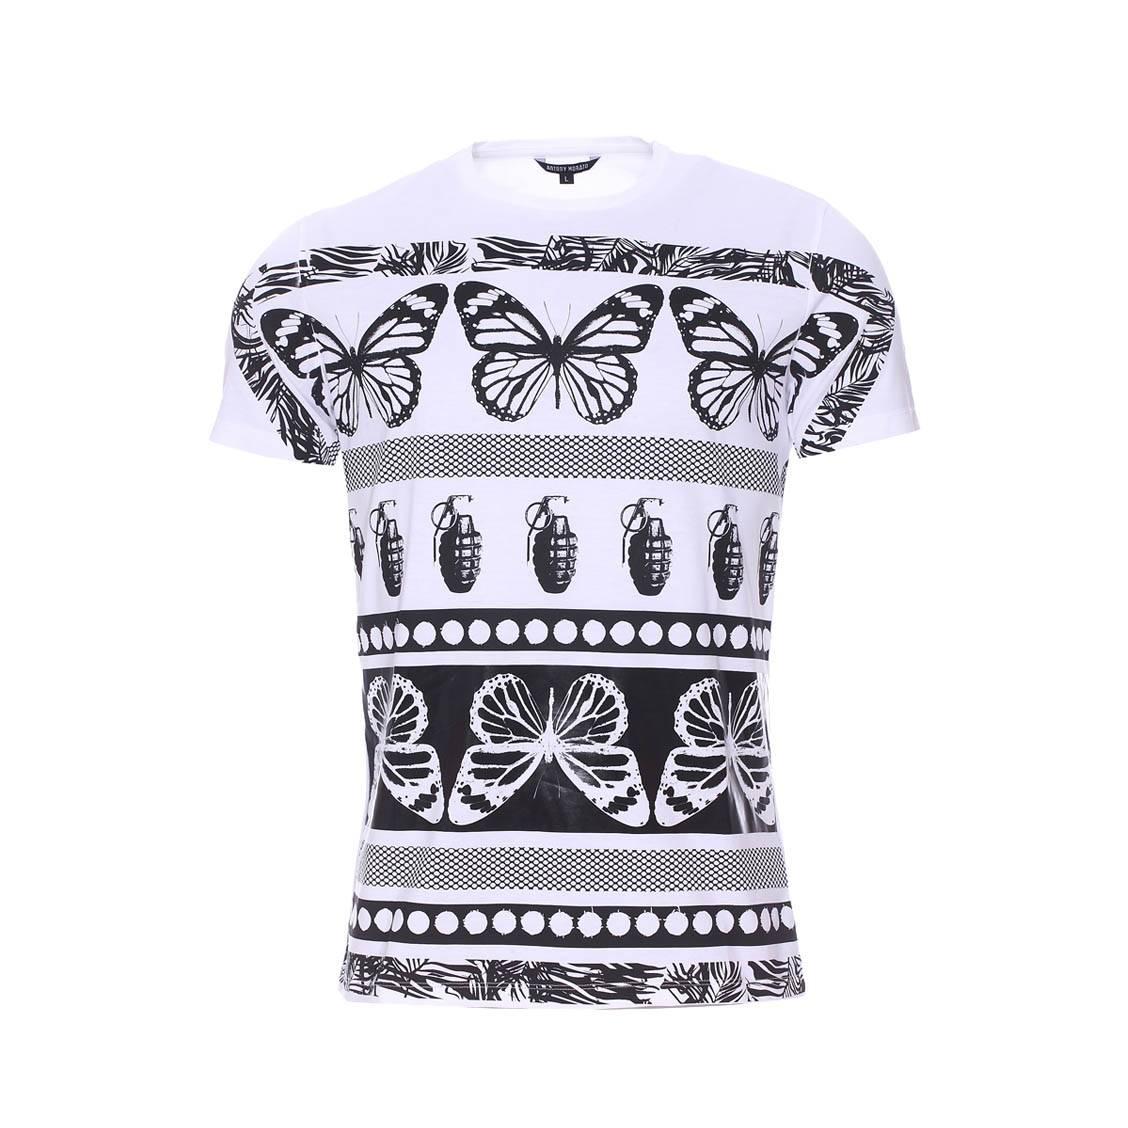 061c02379b2 Tee-shirt col rond Antony Morato blanc à motifs